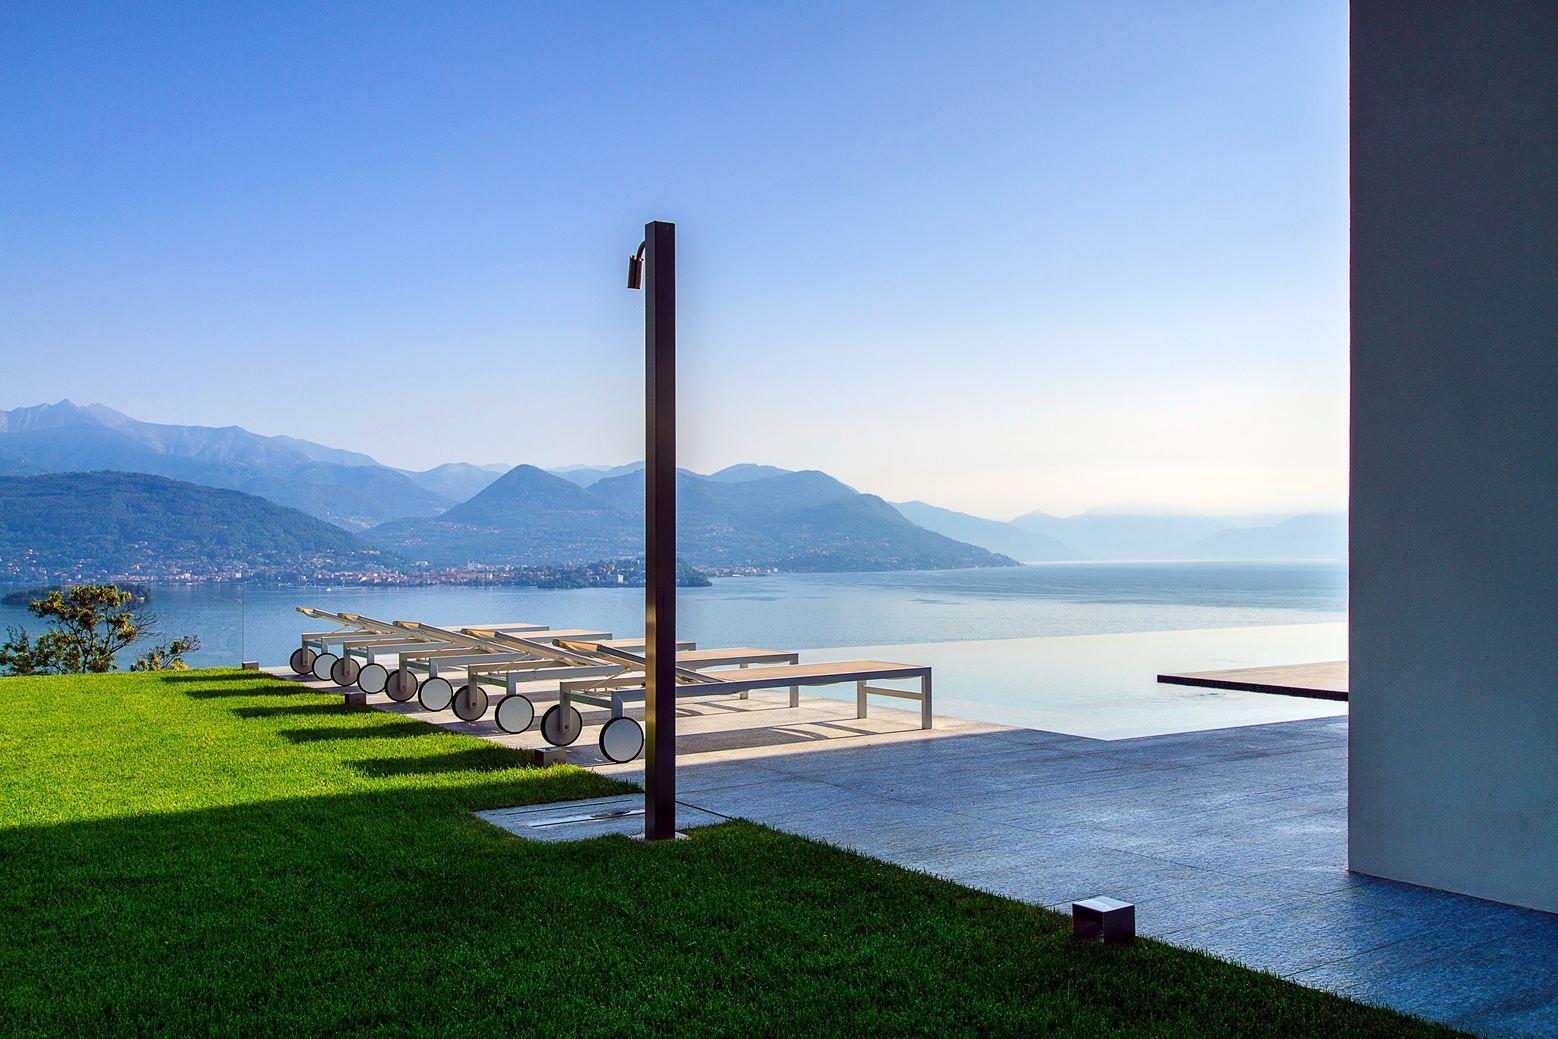 Villa Camilla in Stresa, Italy by Roberta Manessi